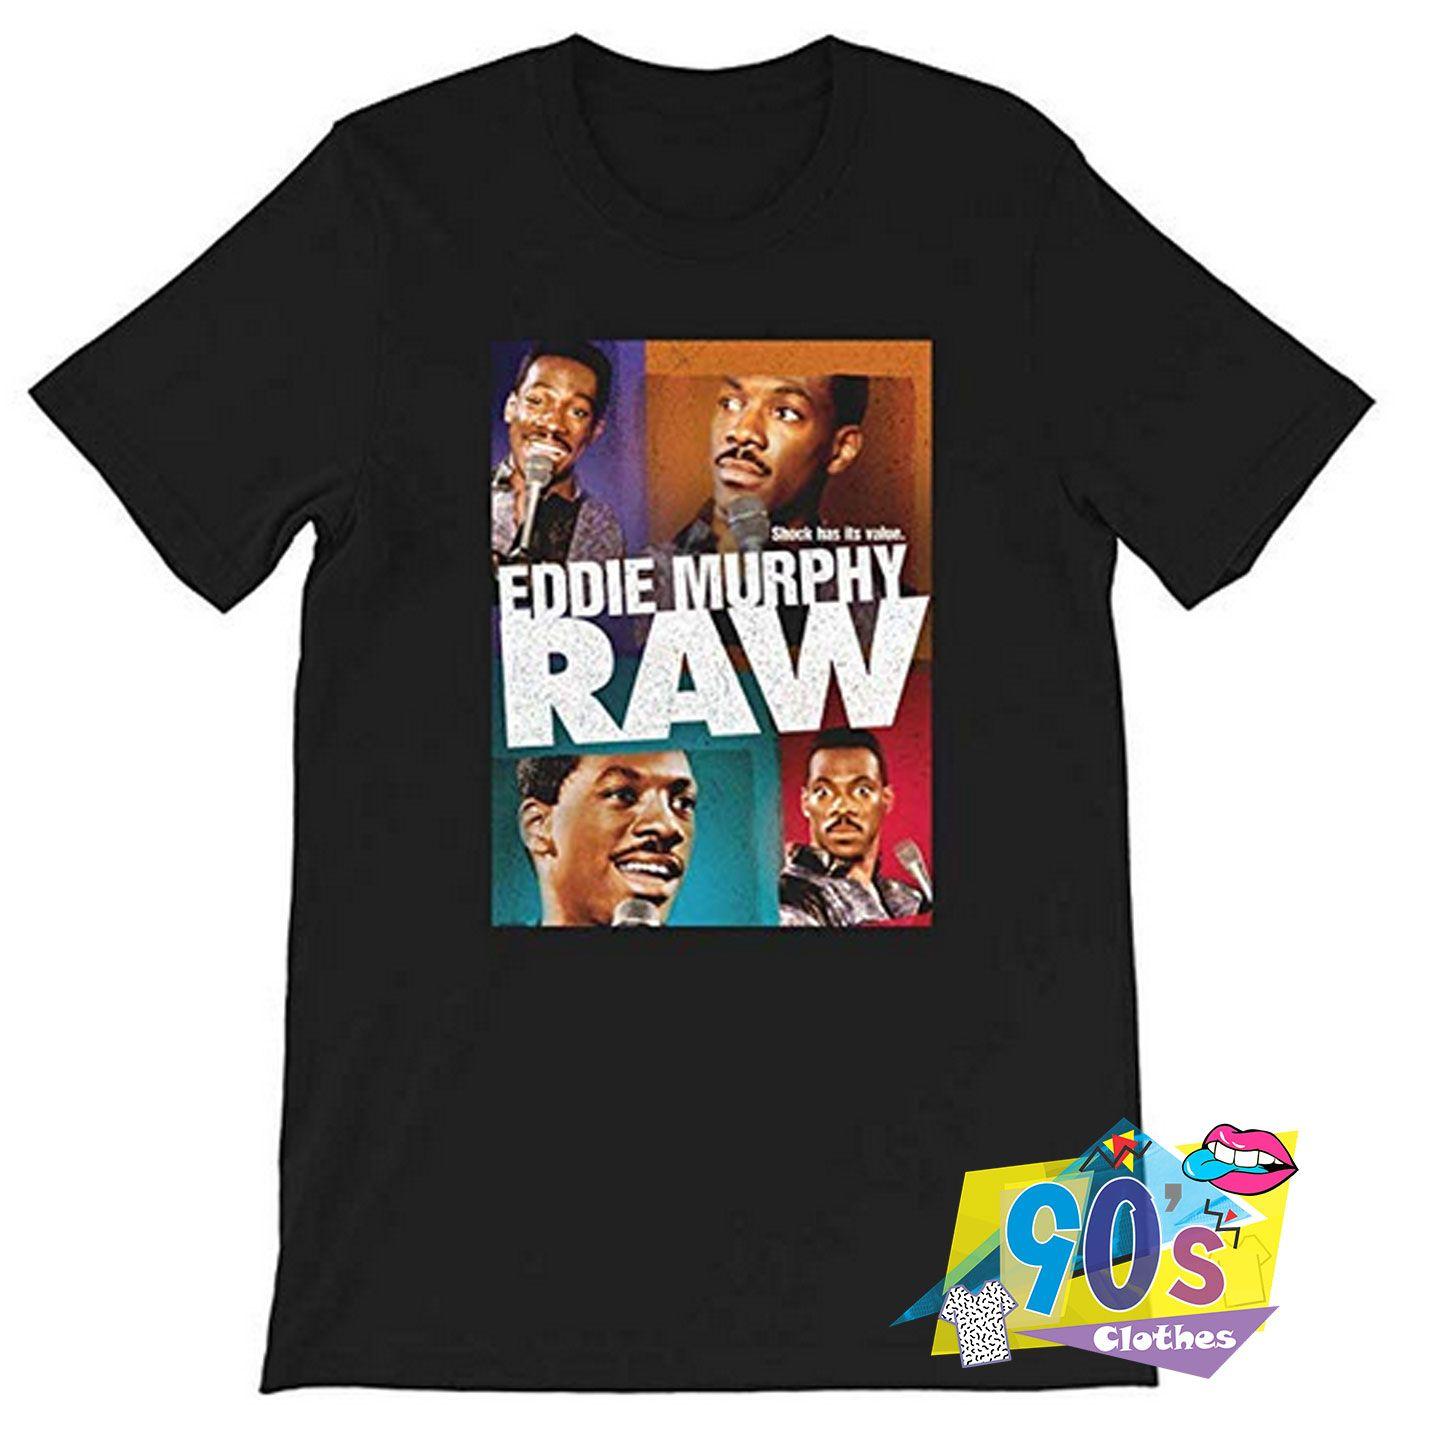 Eddie Murphy Raw Hollywood Actor Comedian T shirt #decadedayoutfits